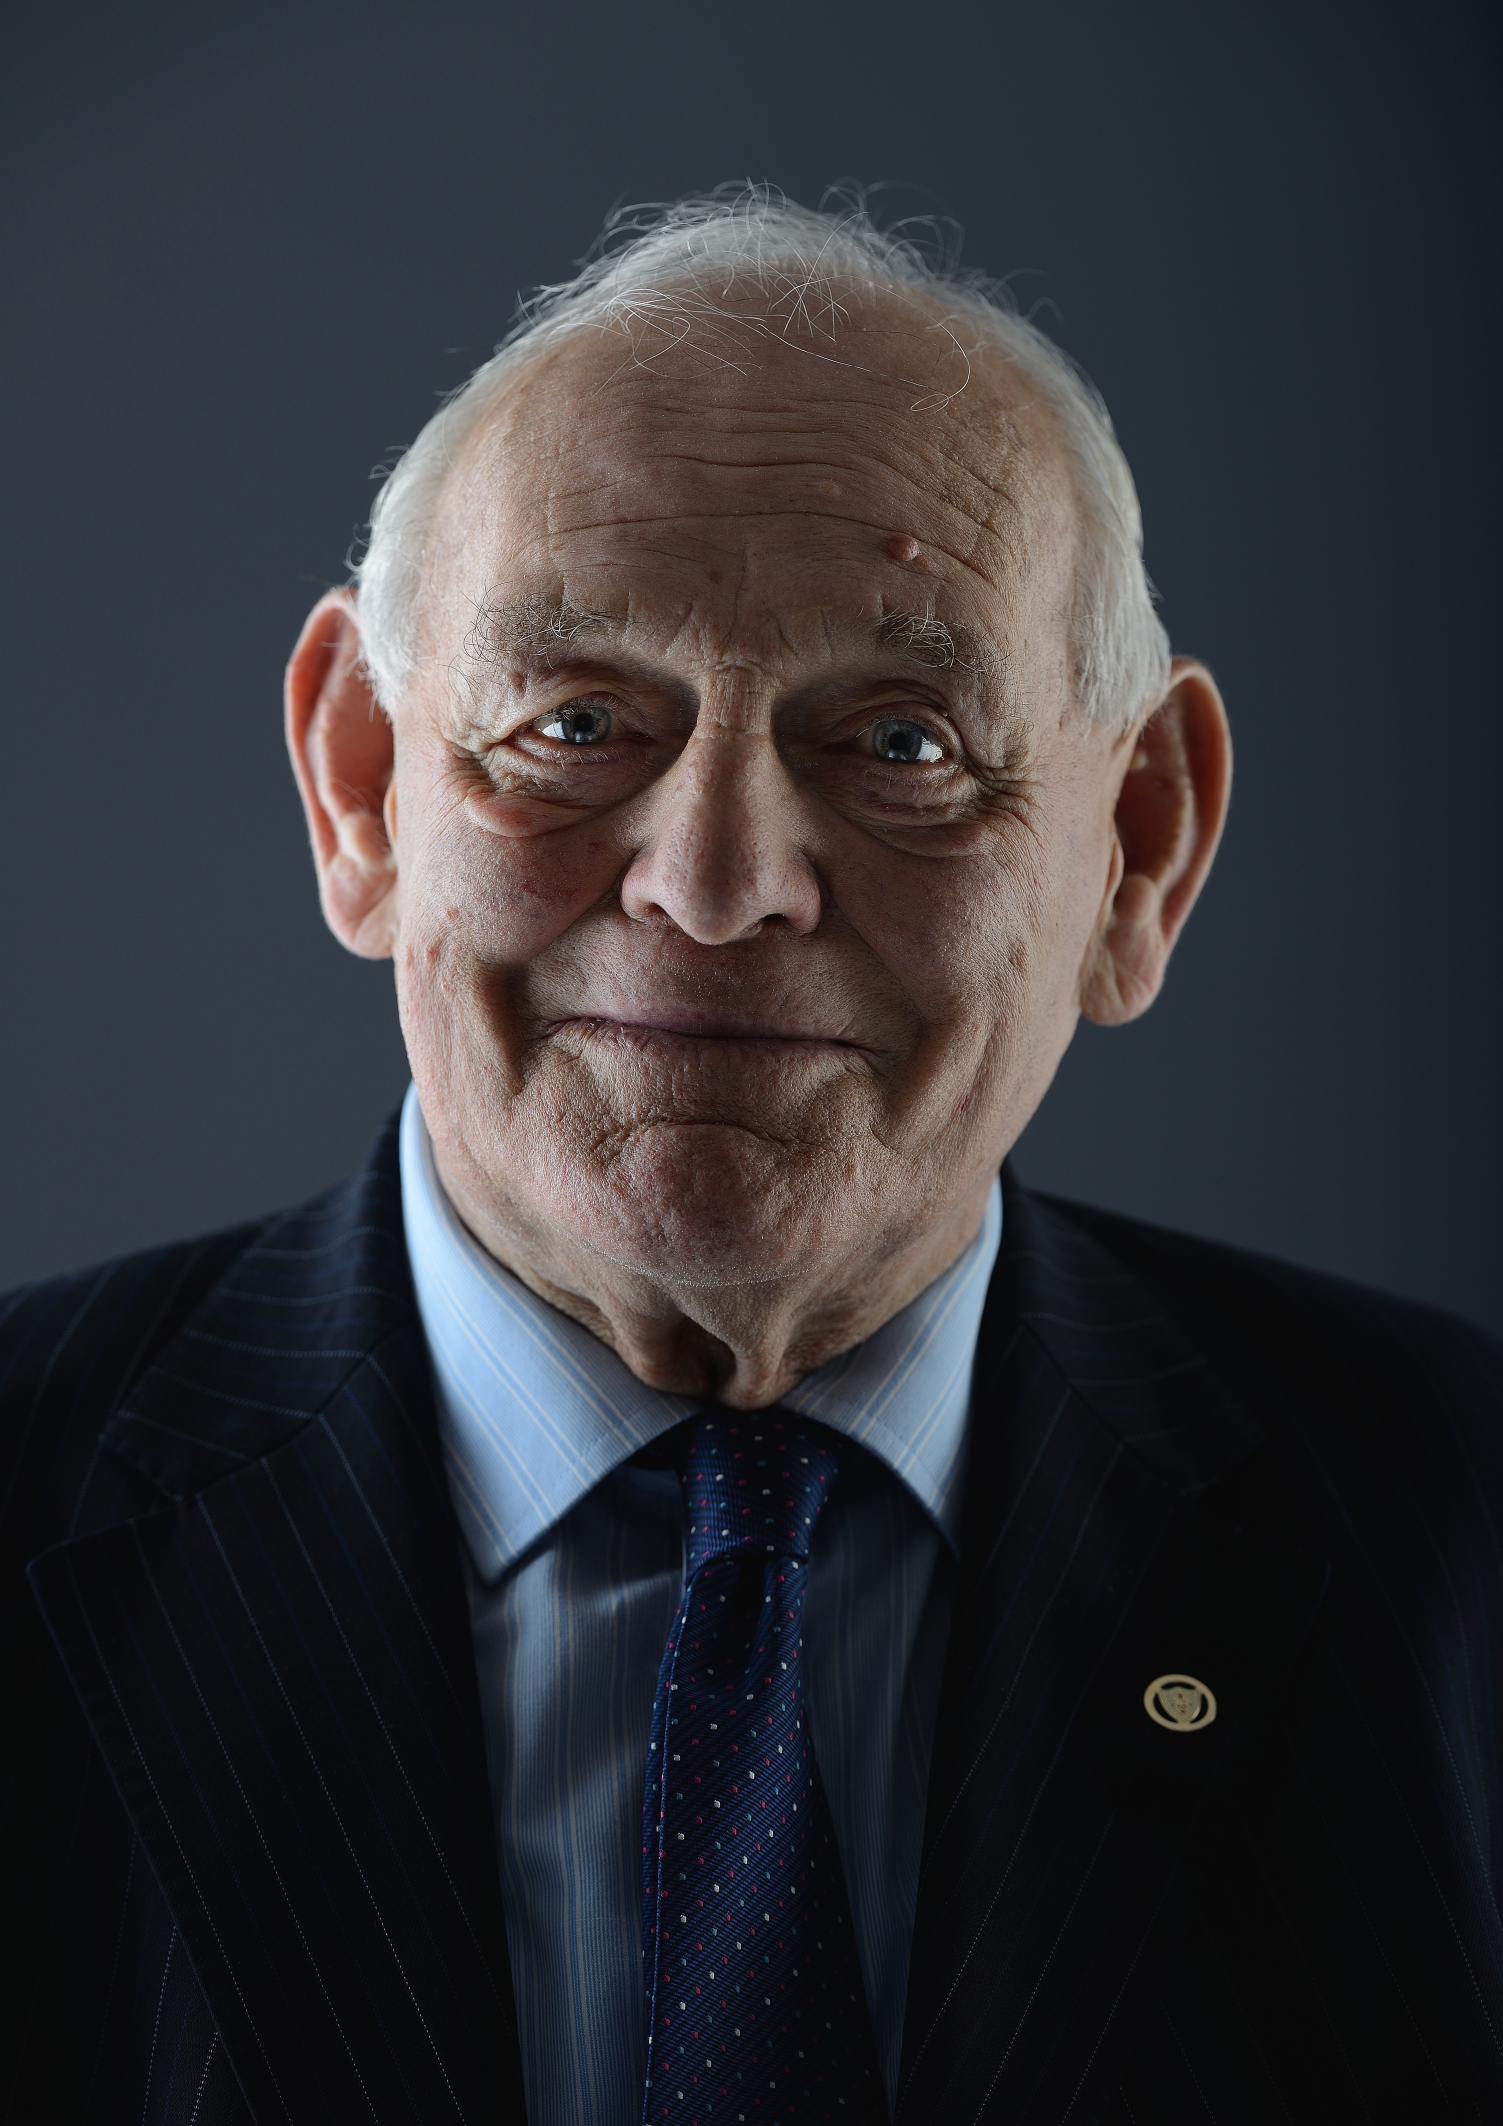 Galway Mayo Man's Portrait Ireland